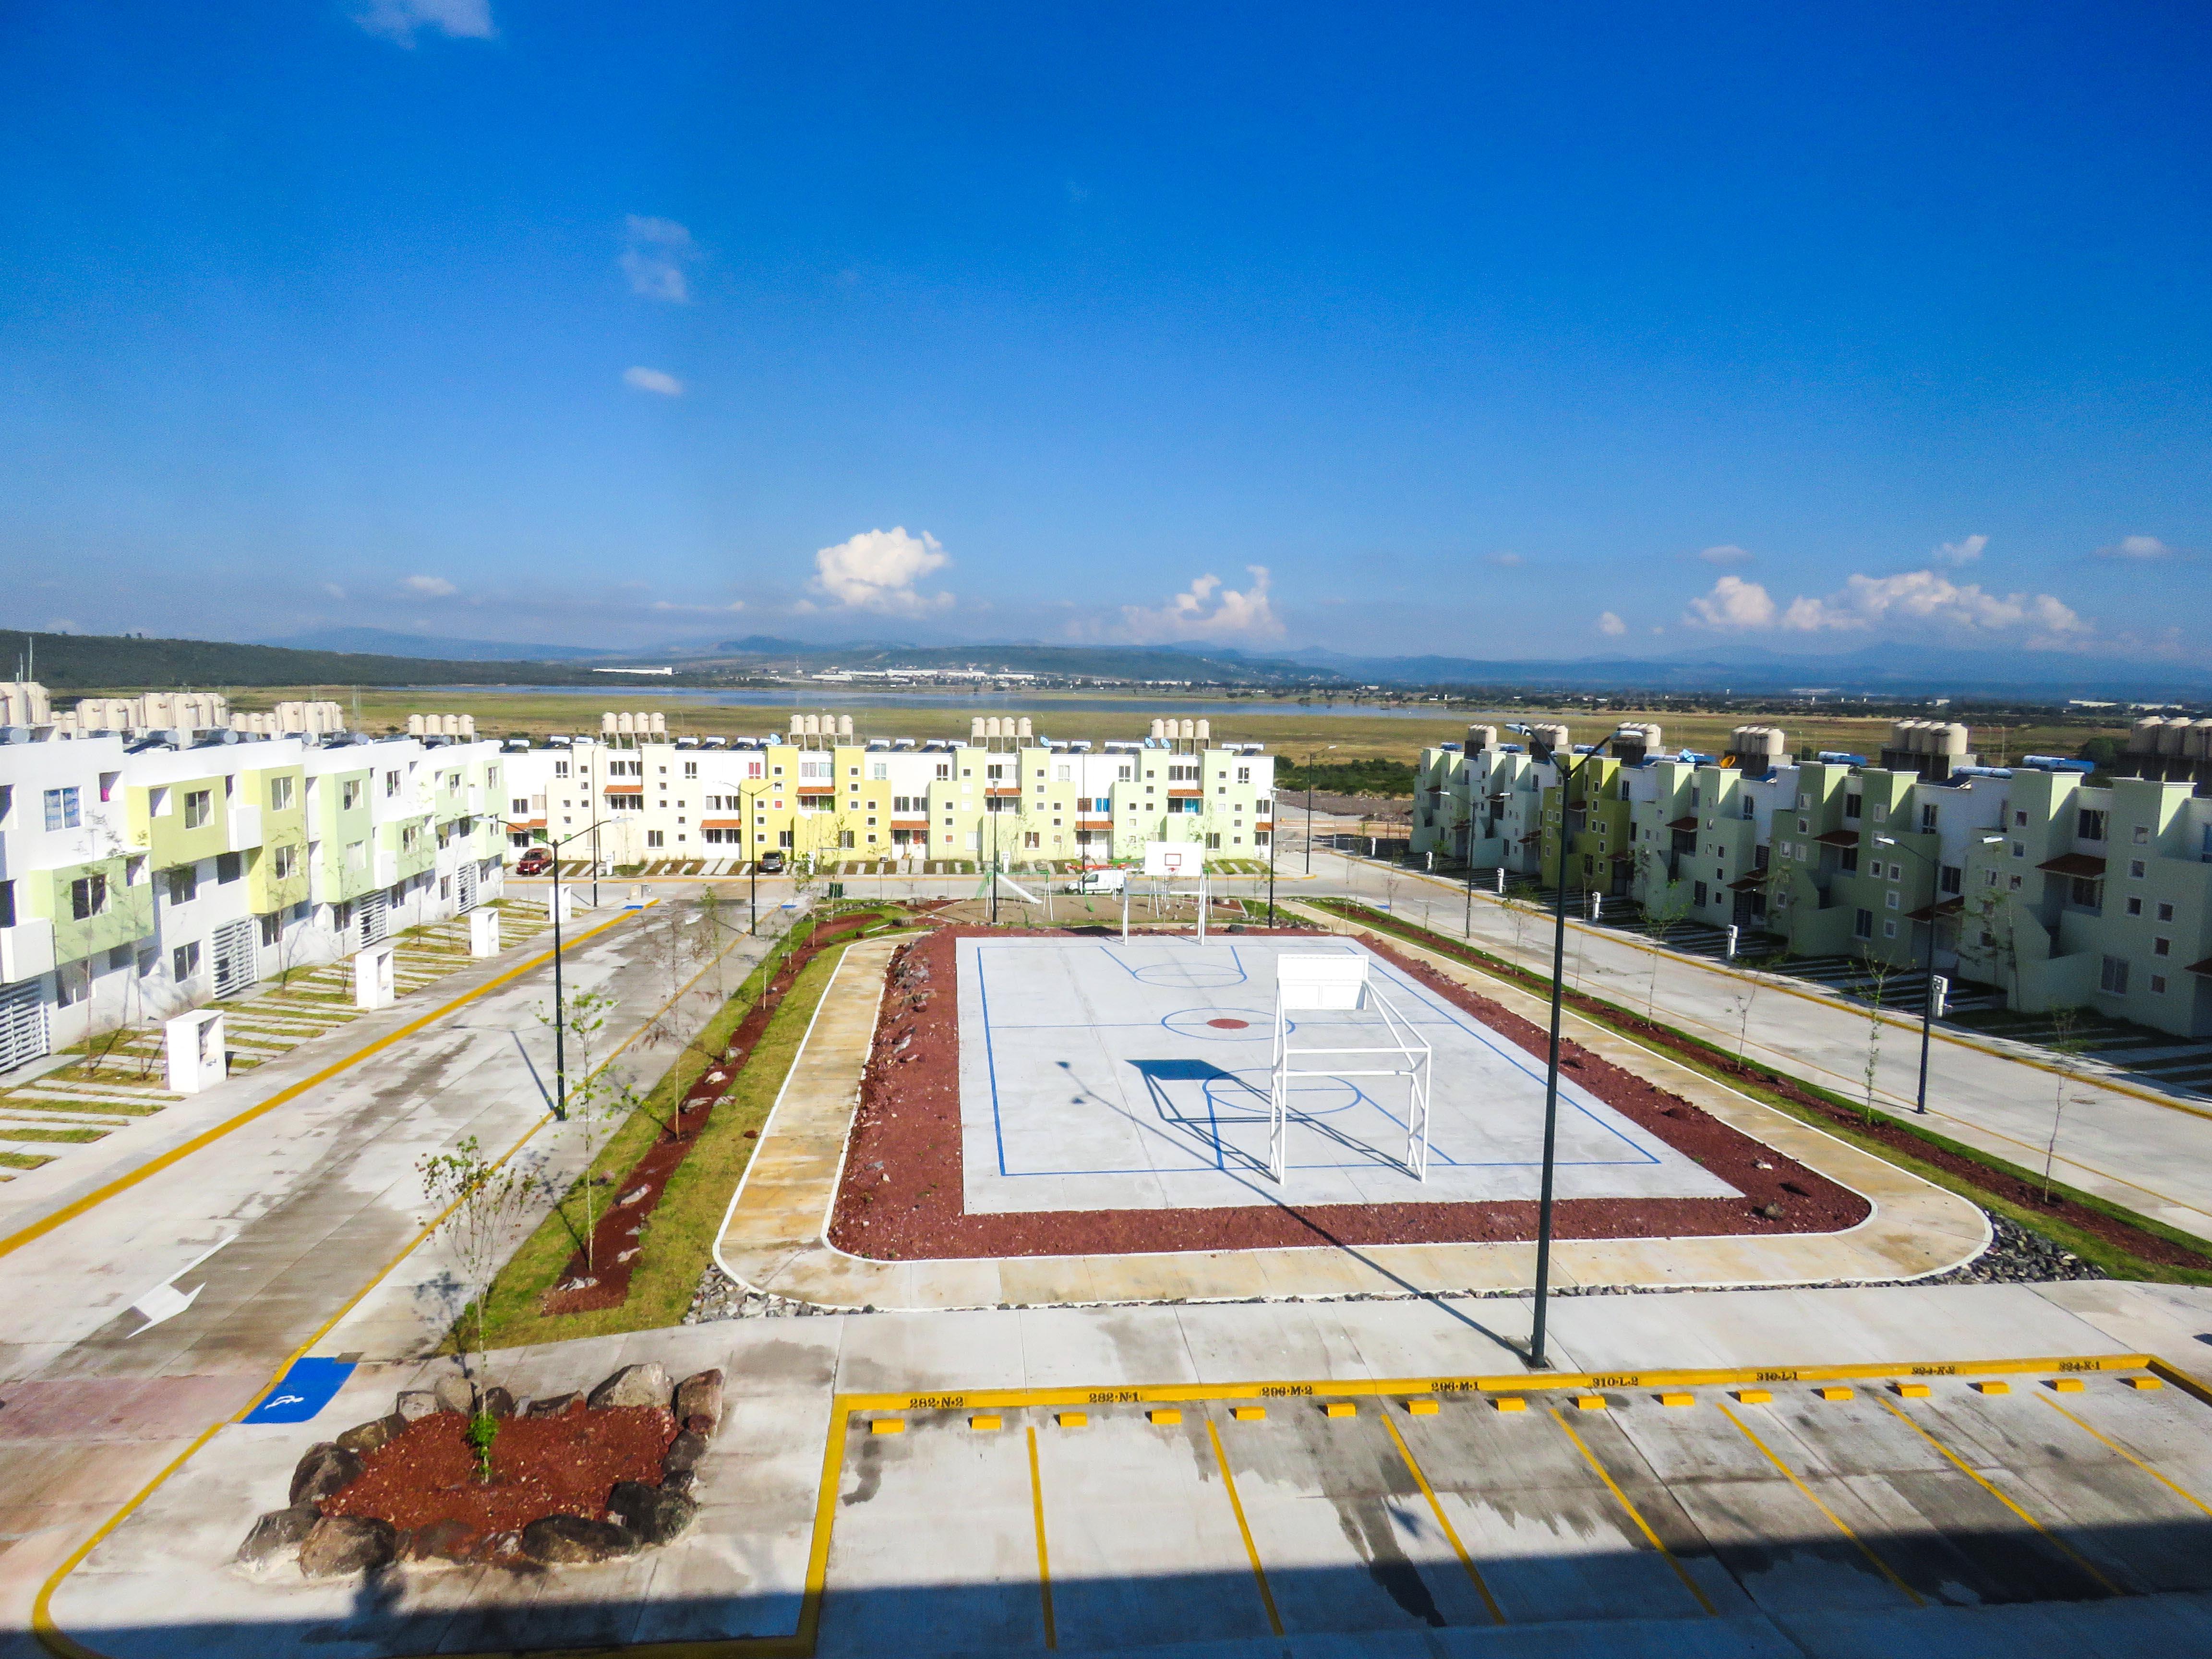 Imagen Urbana - Villas del Rey